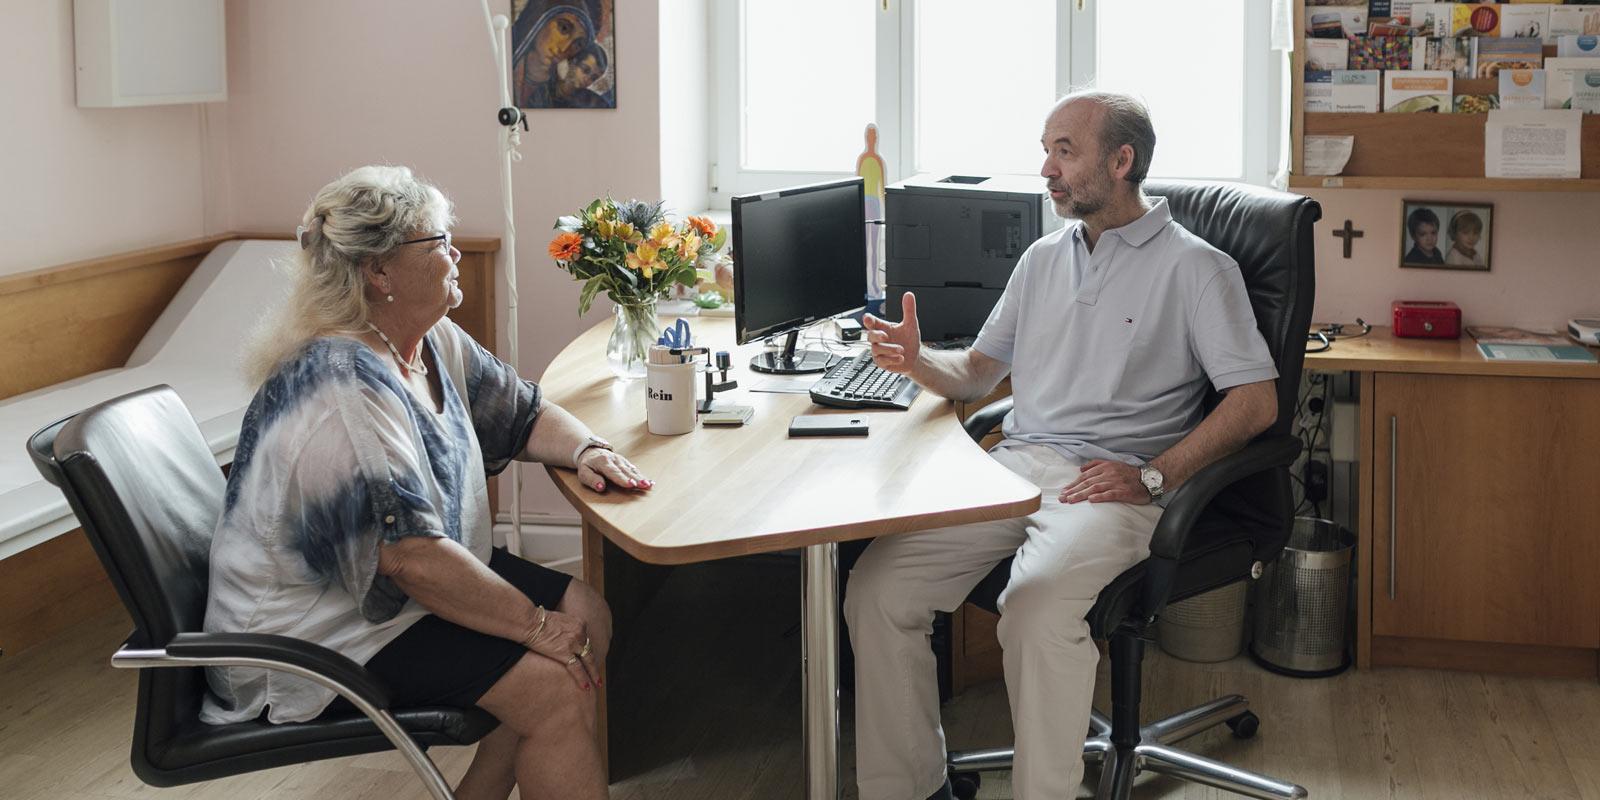 Dr. Ledermüller - Privatordination auf Wunsch